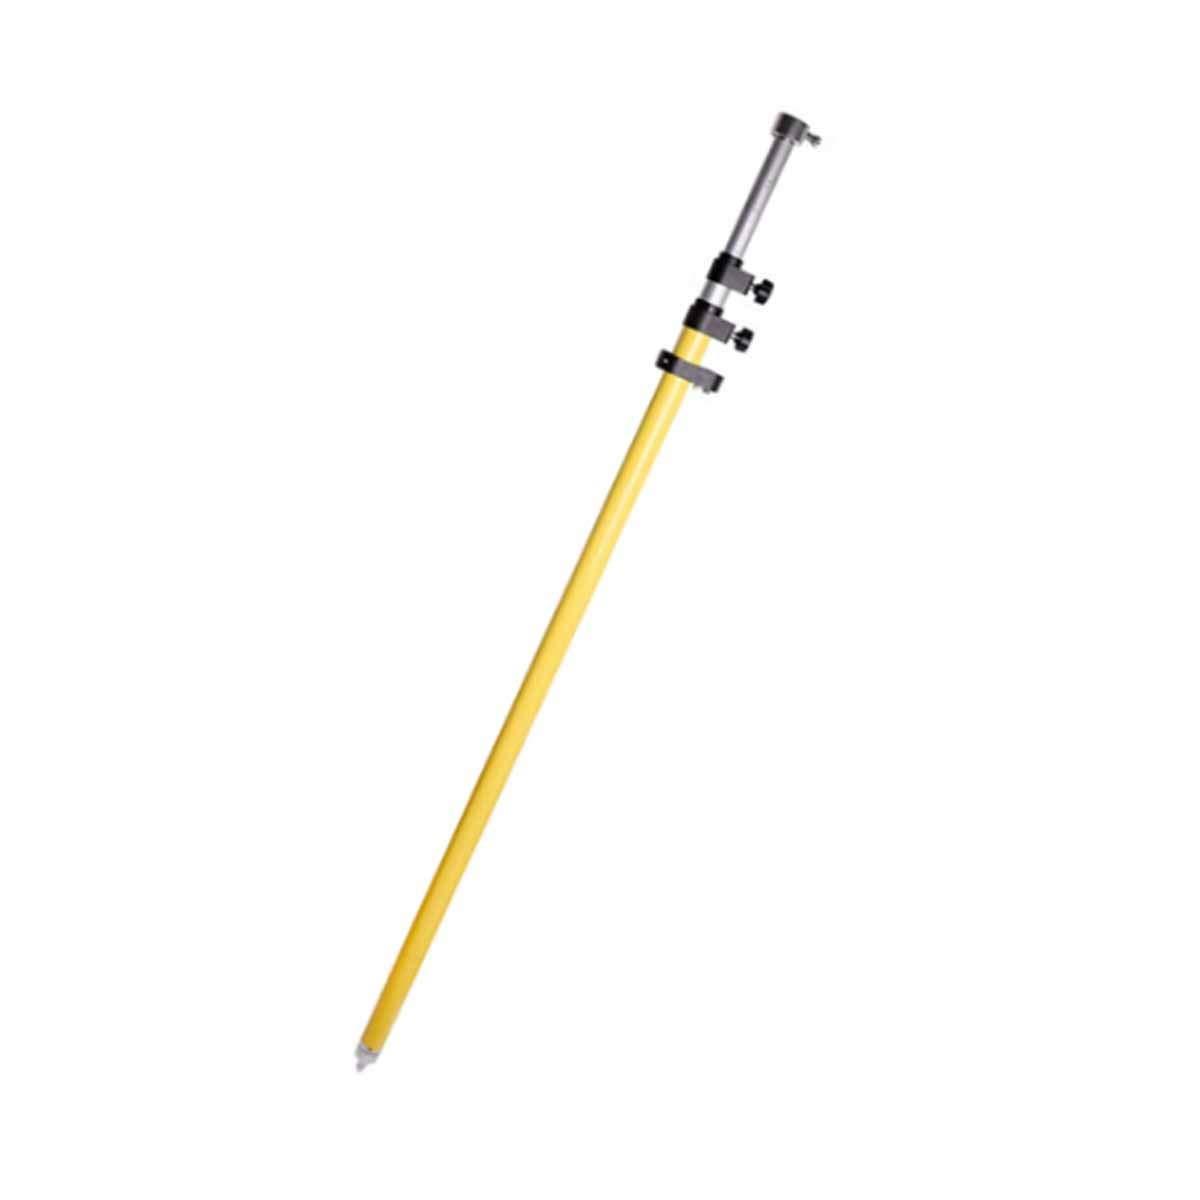 Centering Rod, Aluminum Alloy 2 M Centering Rod 3 M Centering Rod 5 M Centering Rod Handheld Prism Rod (Size : 3M)